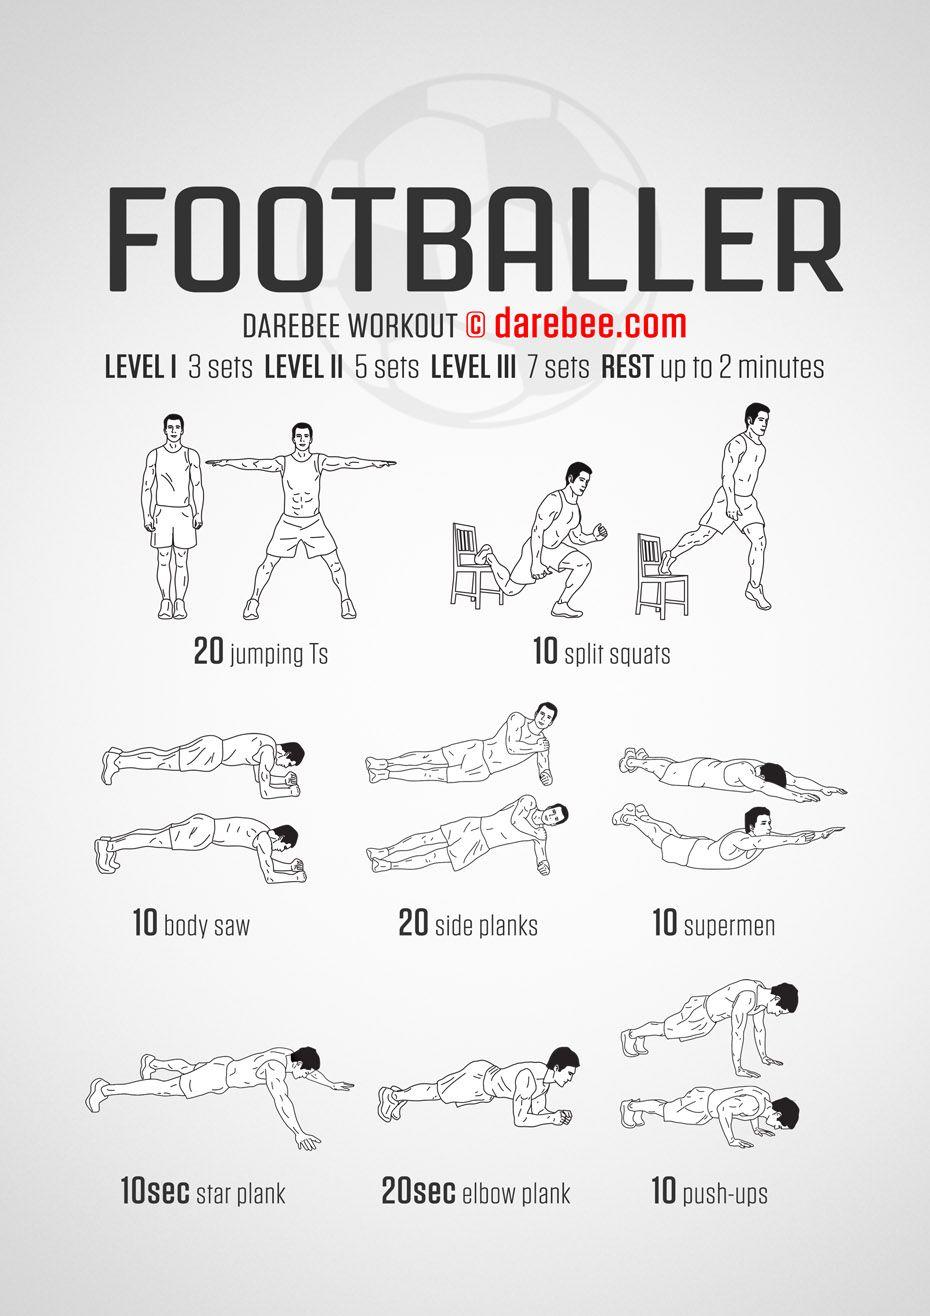 Footballer Workout Soccer Workouts Football Workouts Training Basketball Workouts